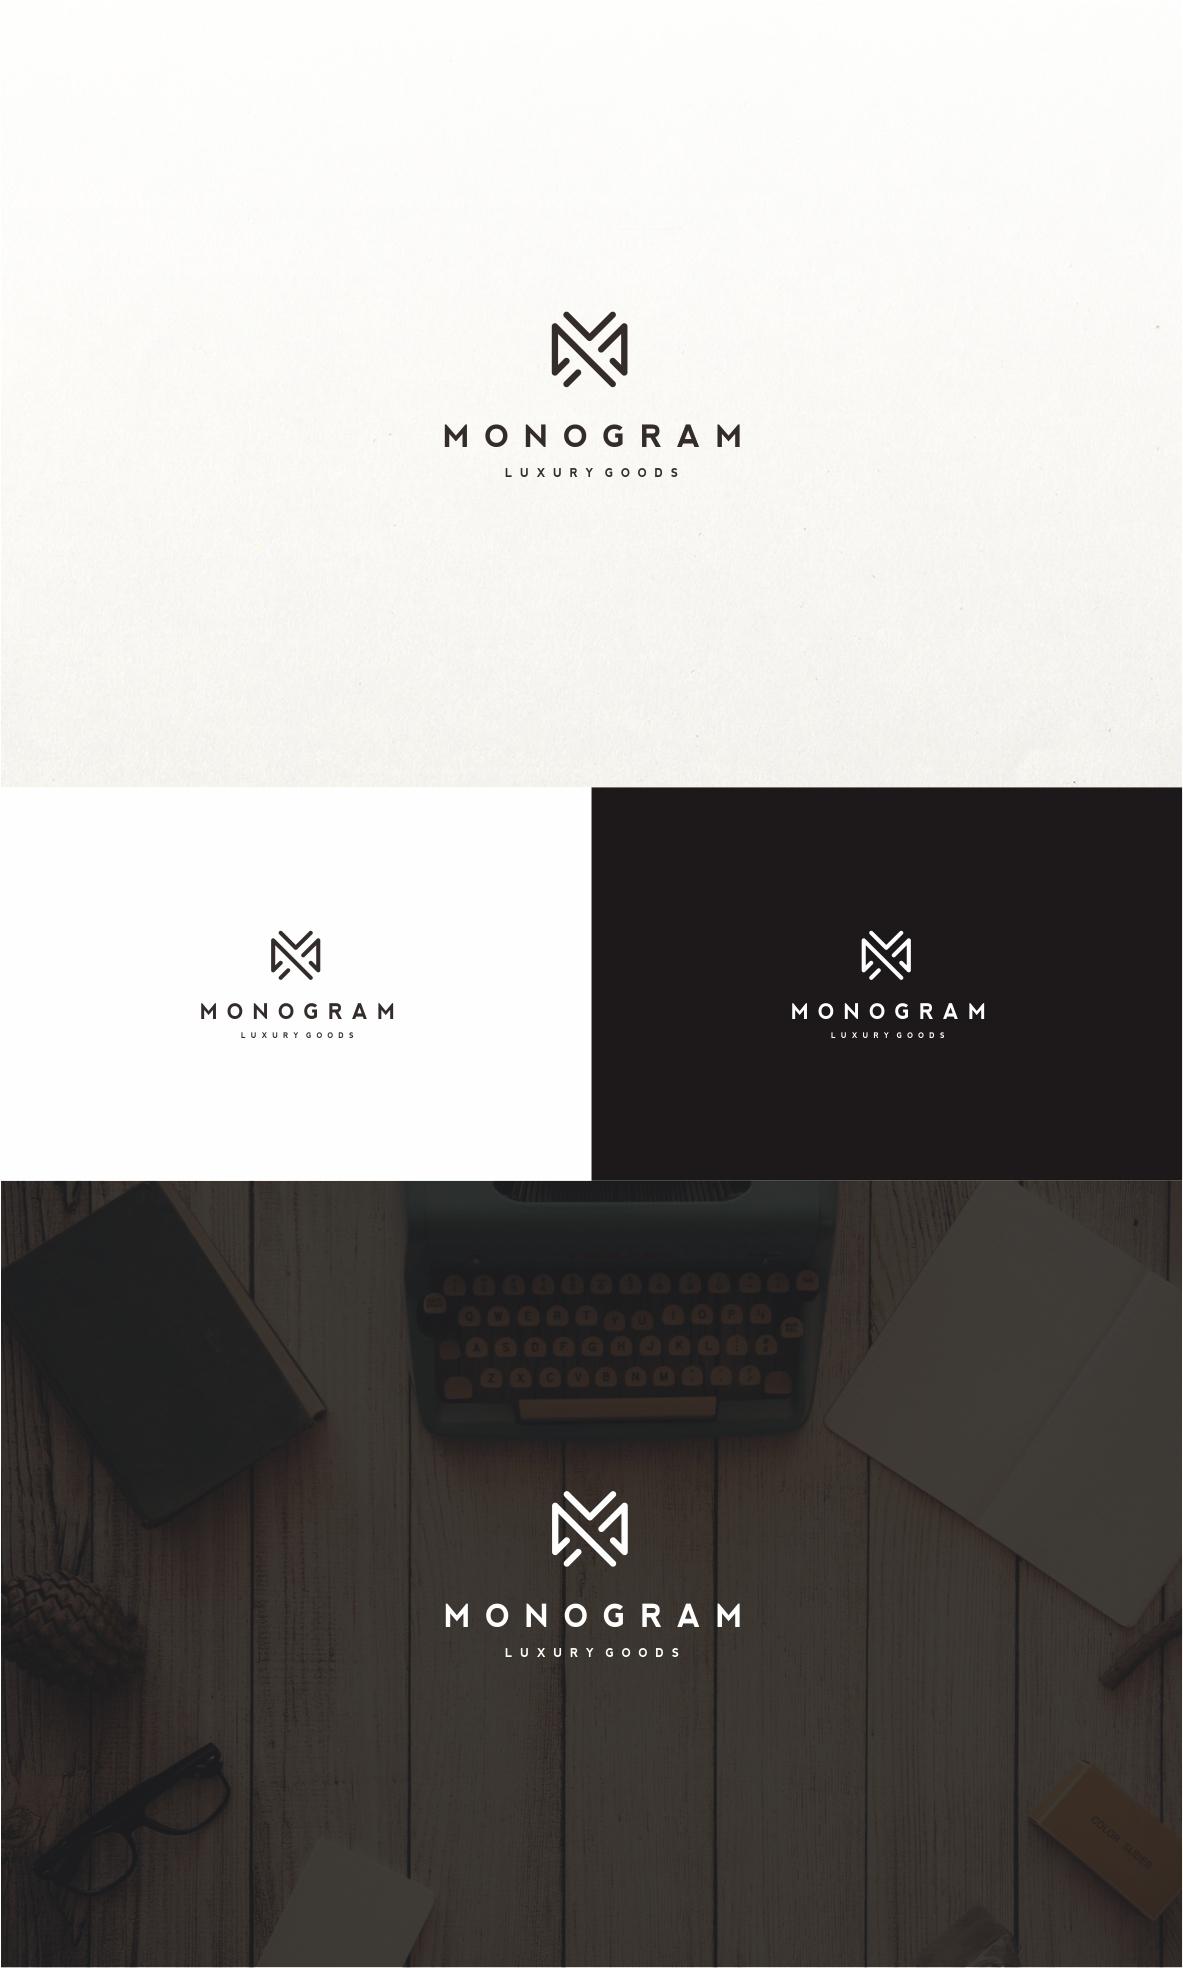 Monogram Logo Retail Luxury Goods Logos Design